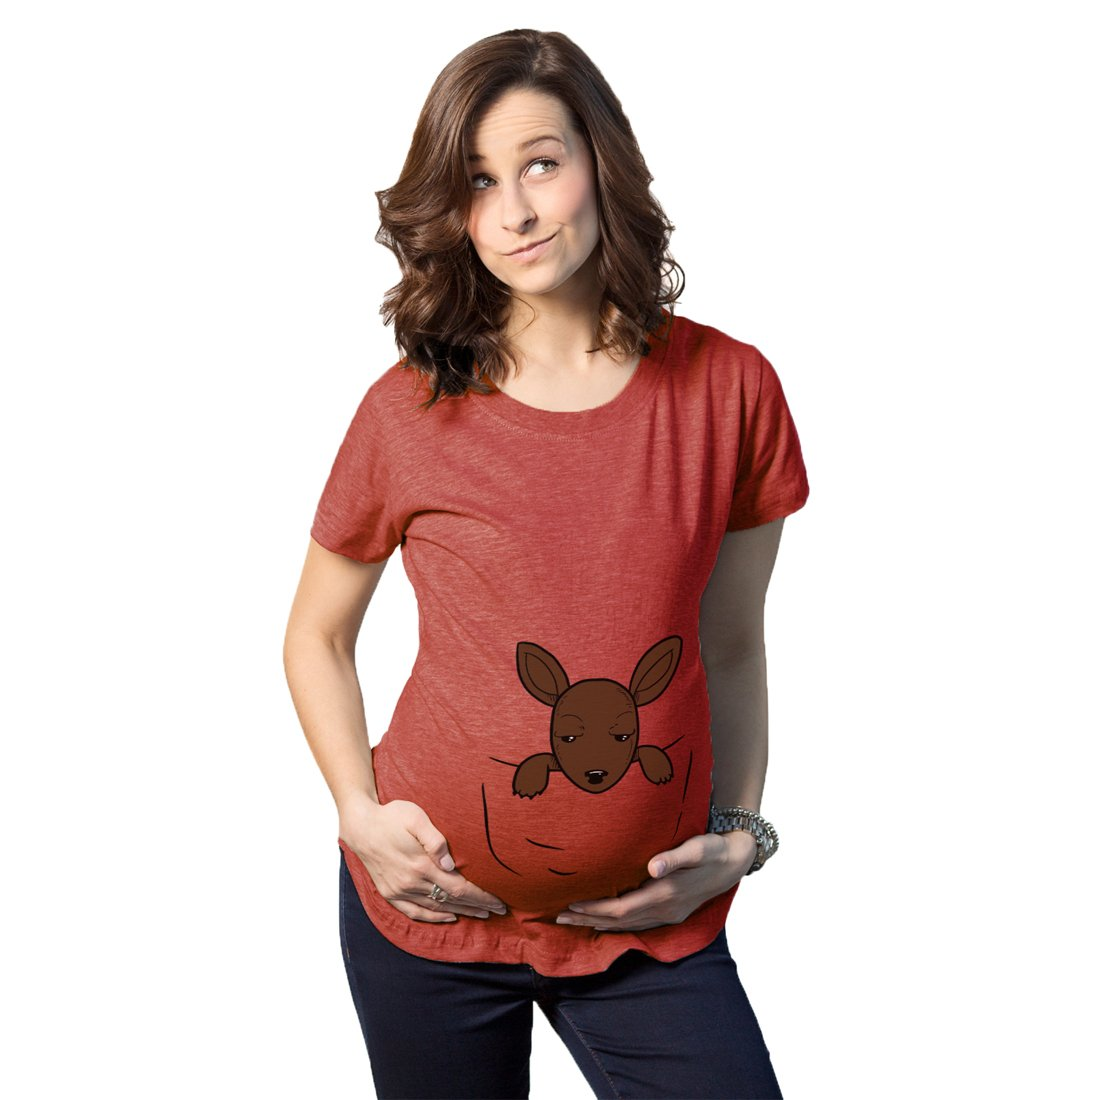 Maternity Peeking Kangaroo Baby Funny Pregnancy Shower Gift T shirt Crazy Dog Tshirts